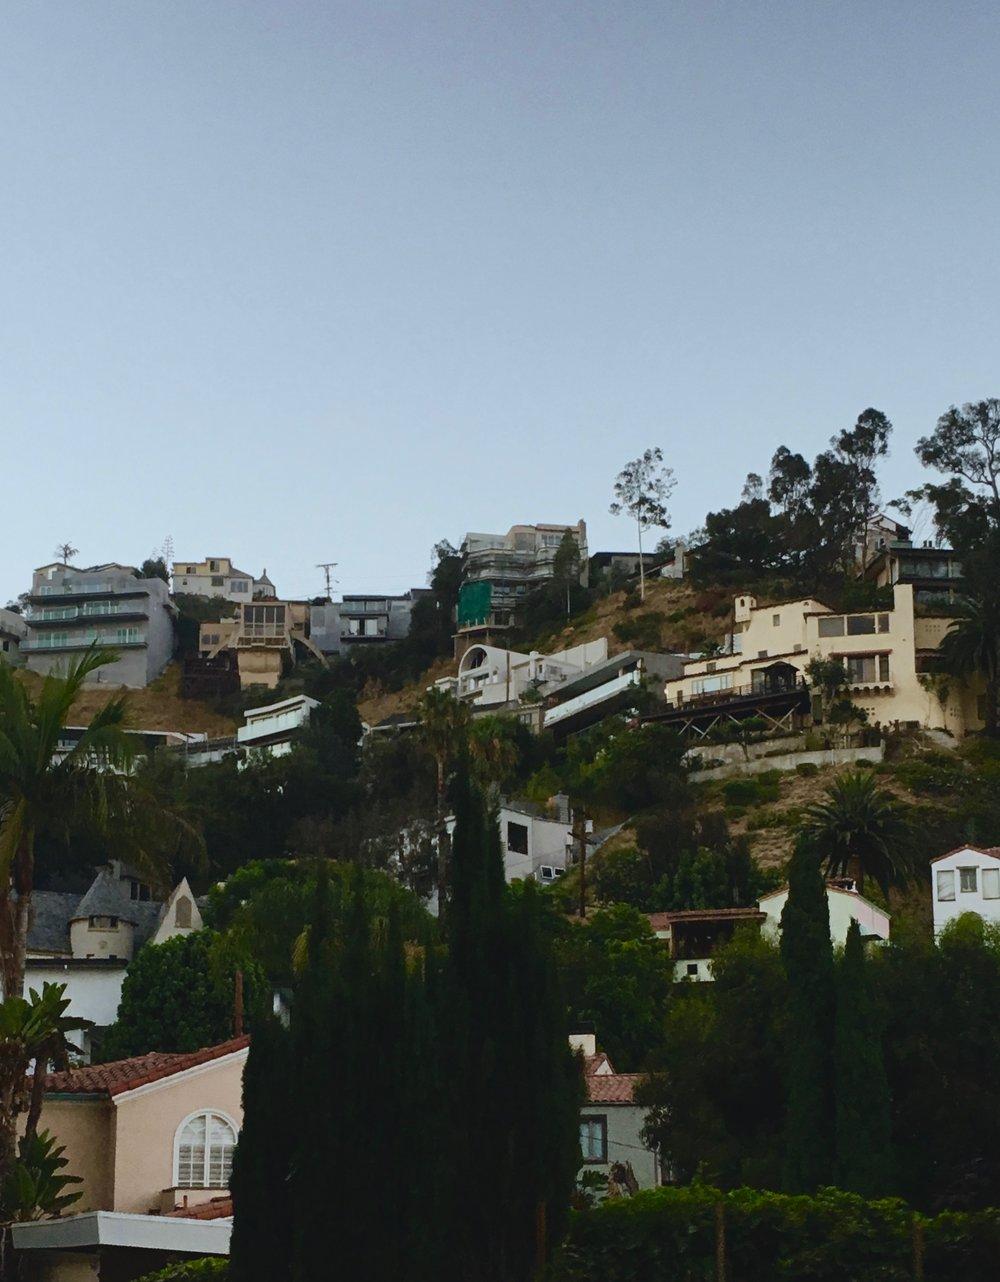 The Hollywood Hills (photo by Meghan Ianiro)